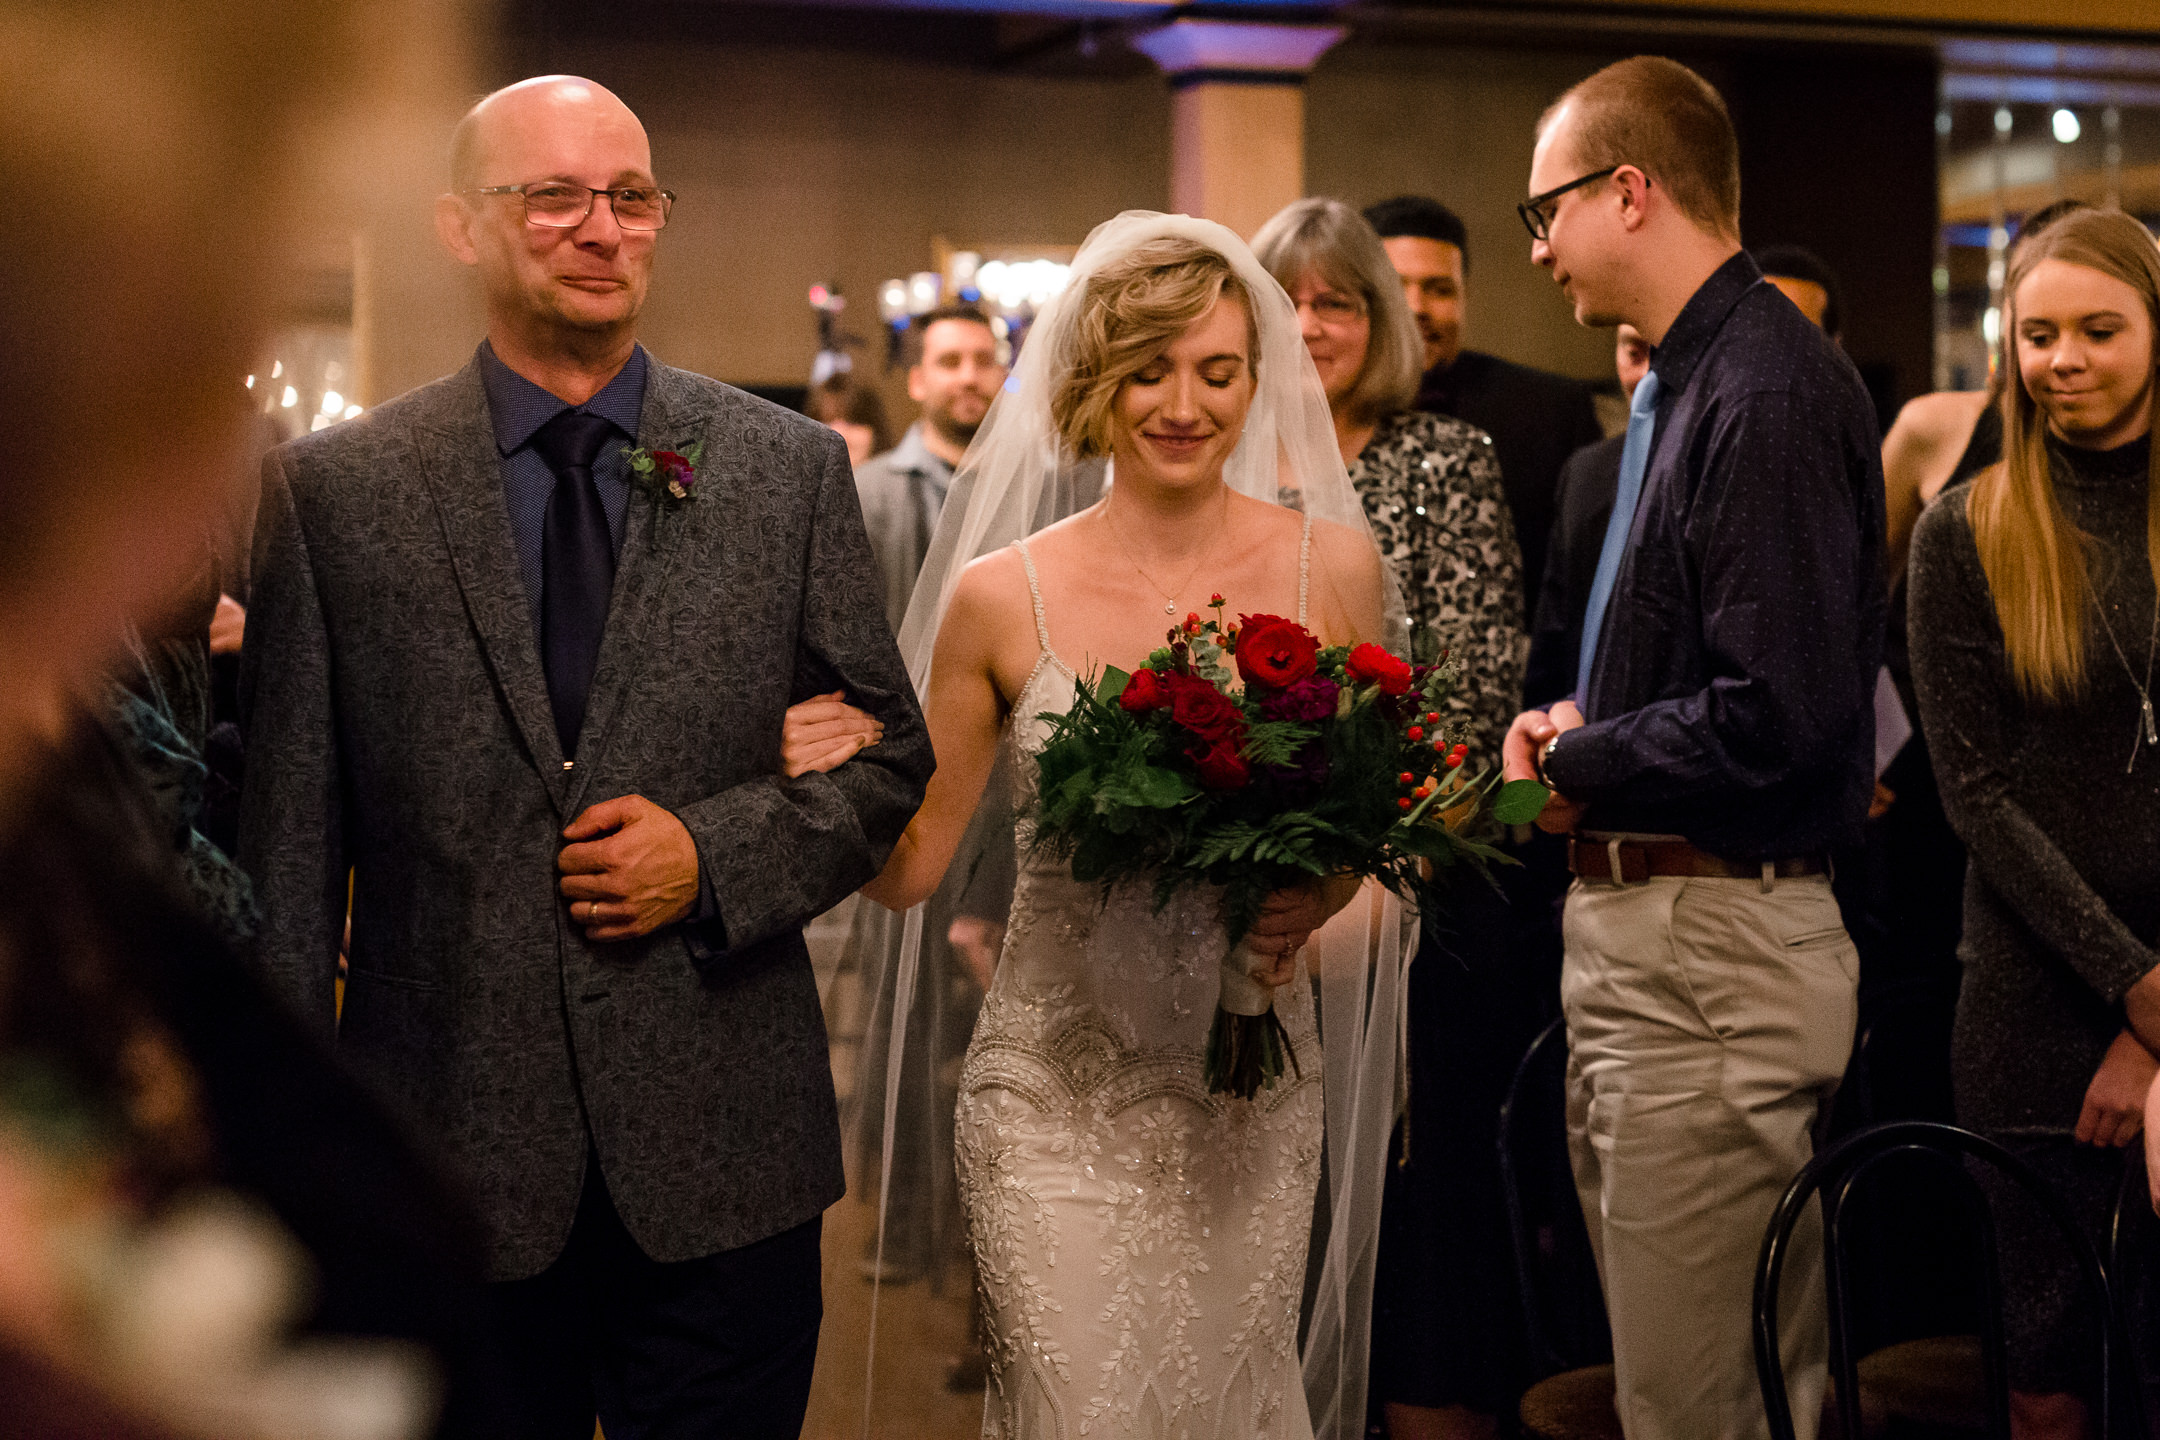 Documentary-Wedding-Photography-Andrew-Tat-Gabi & Kim-13.jpg